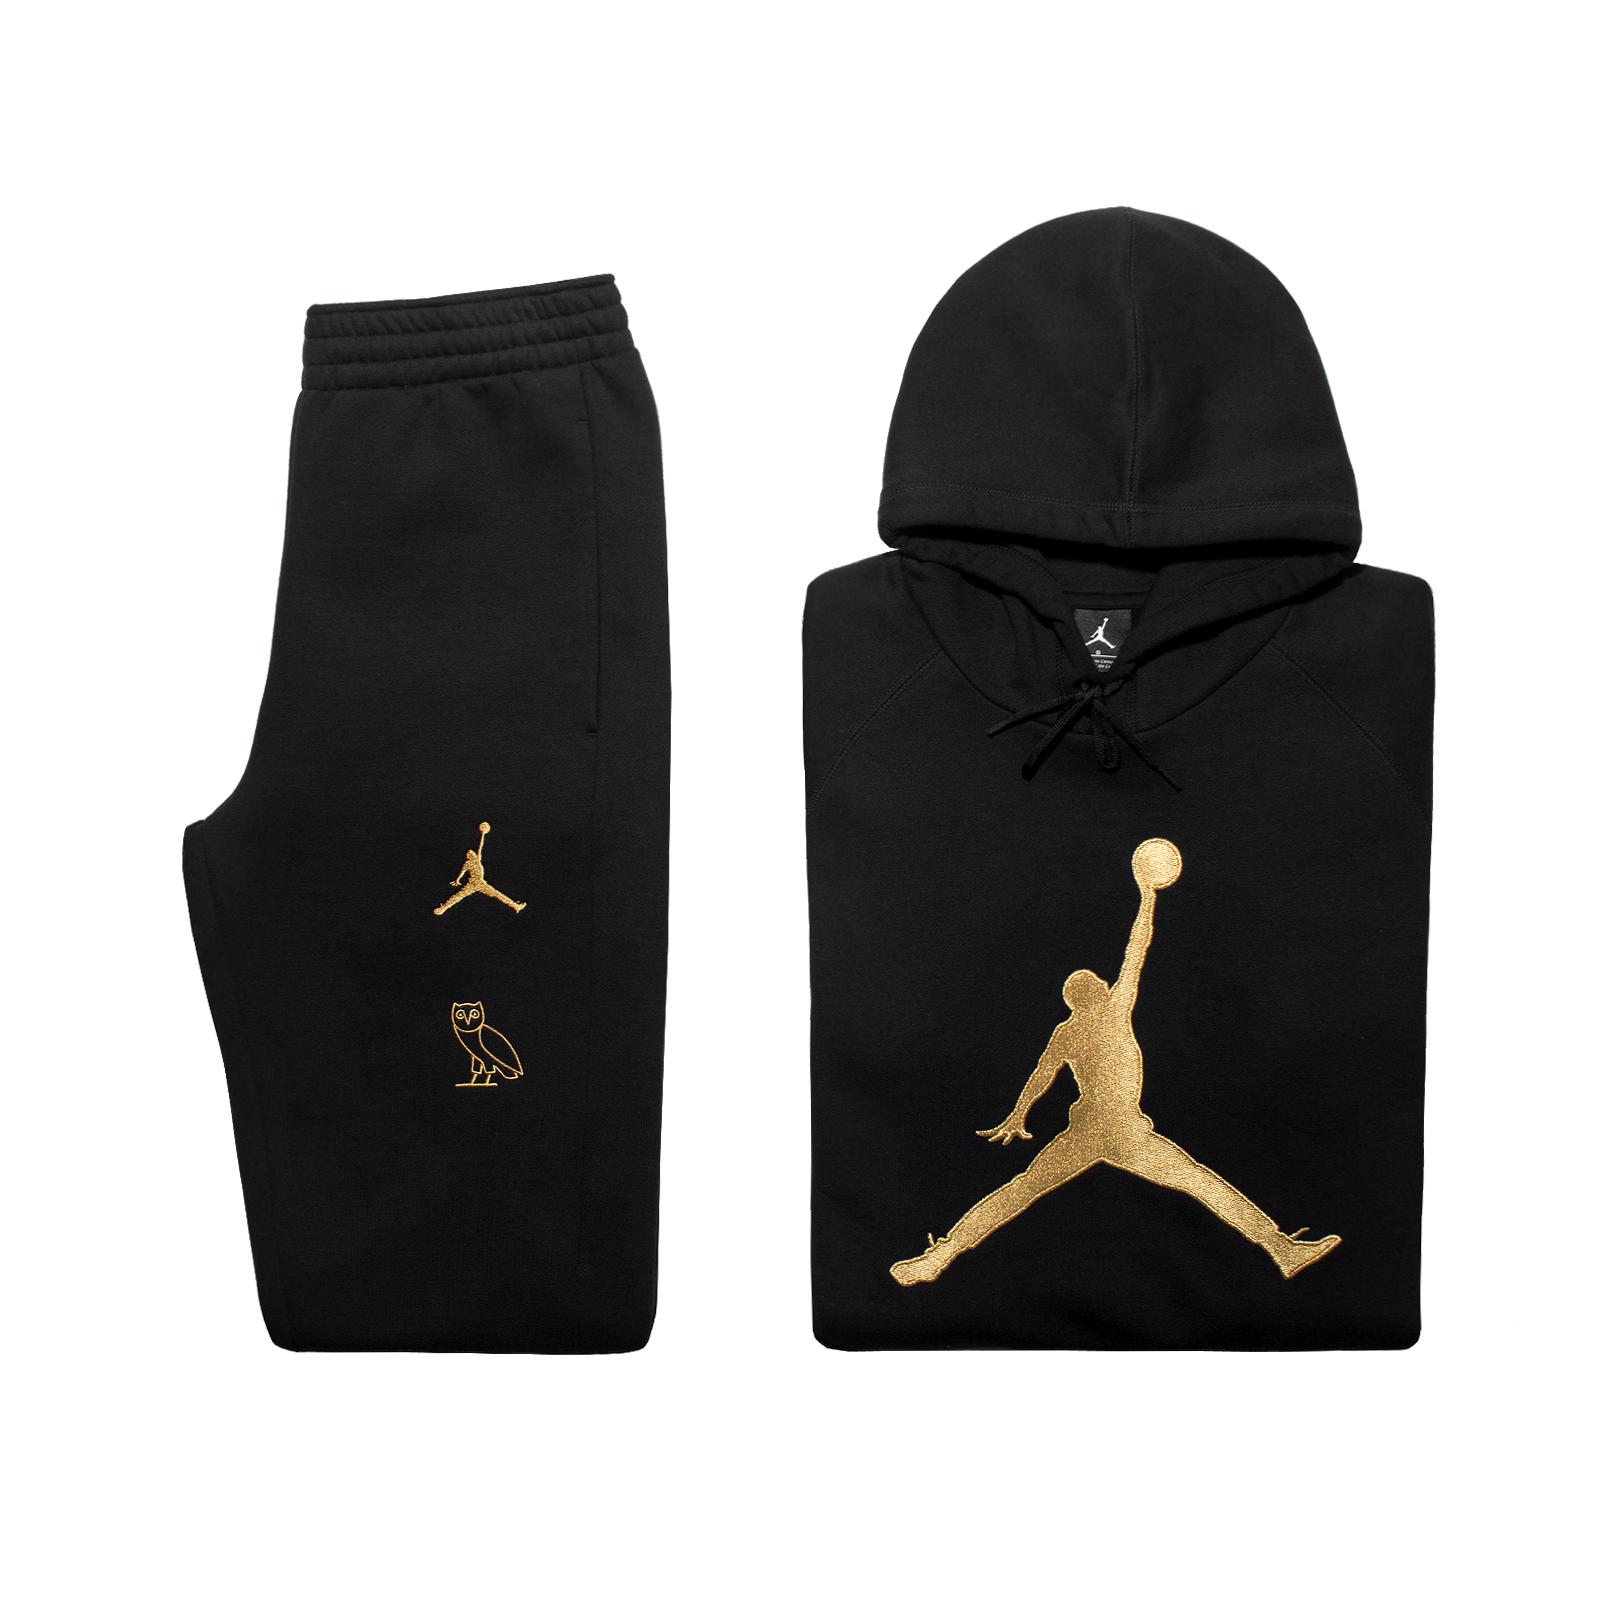 Jordan x OVO All-Star Collection